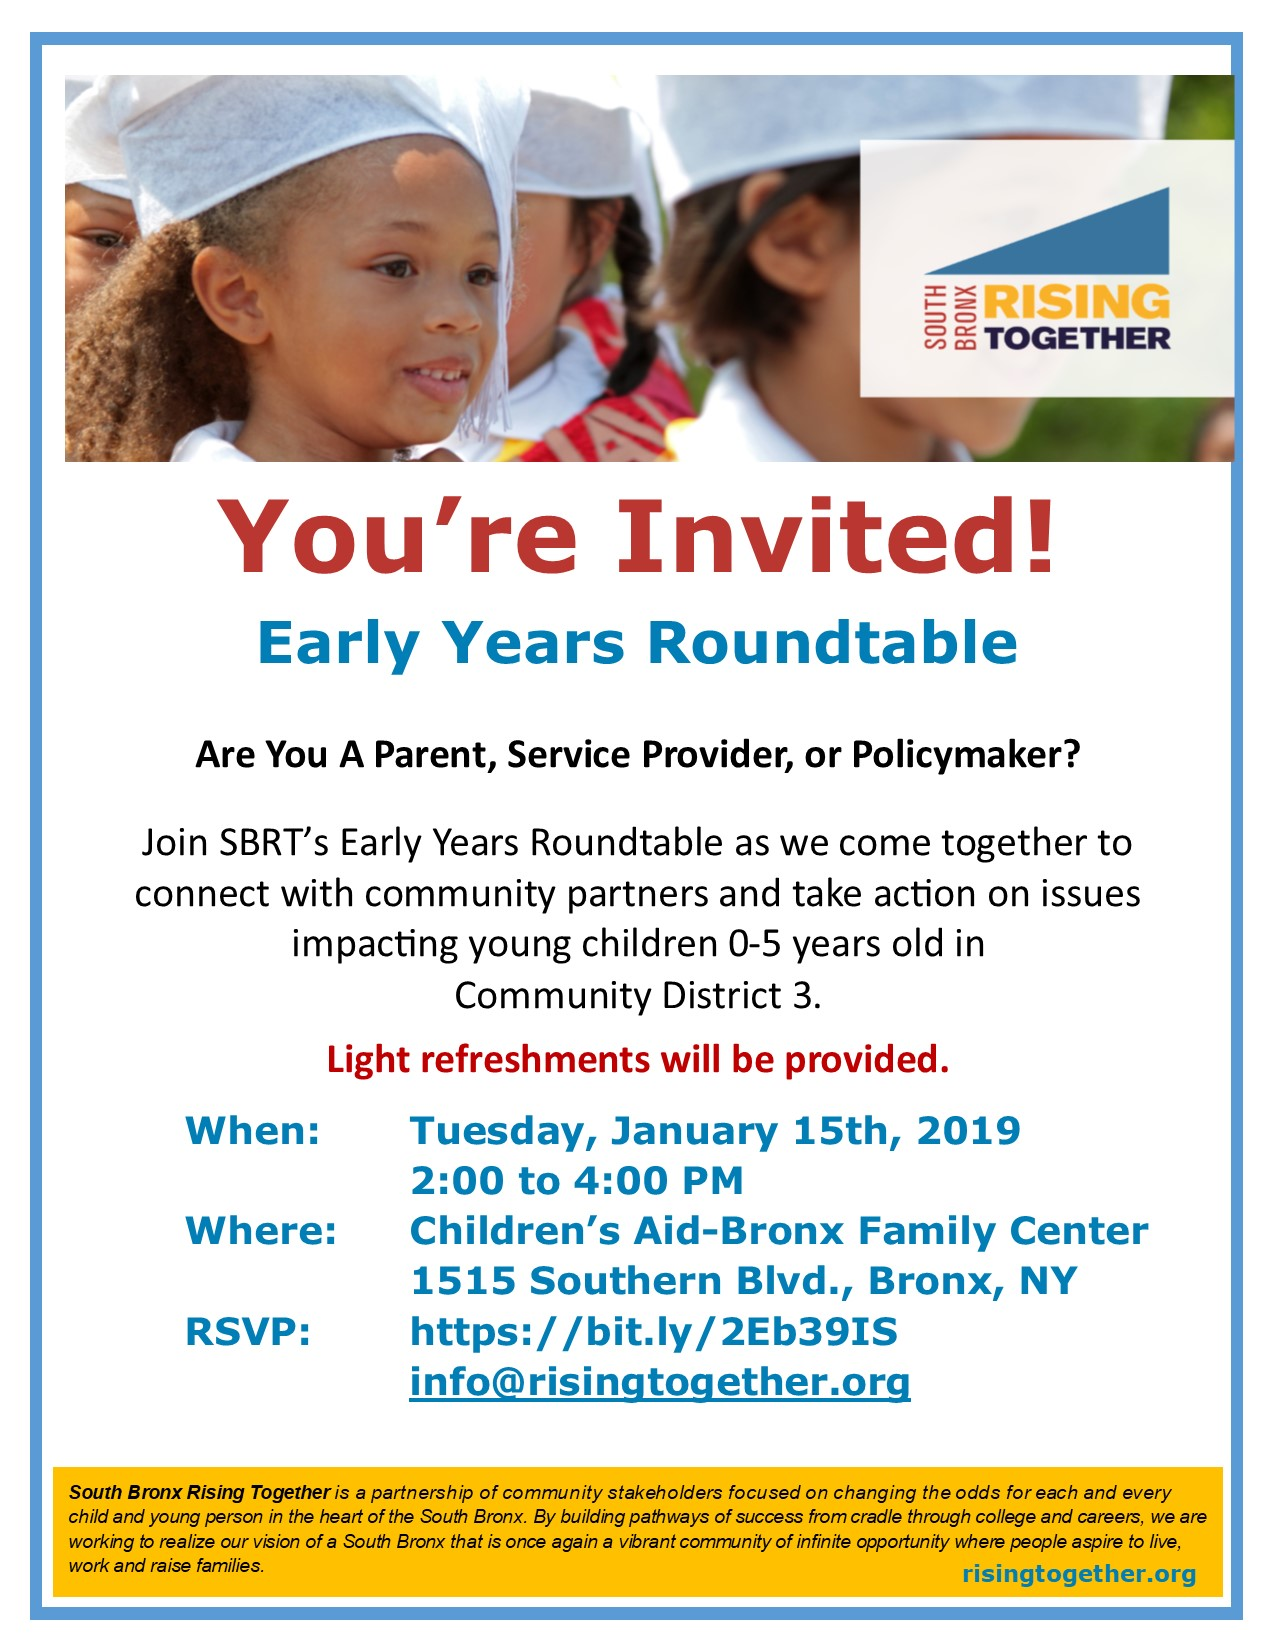 EY Roundtable Flyer January 2019.jpg